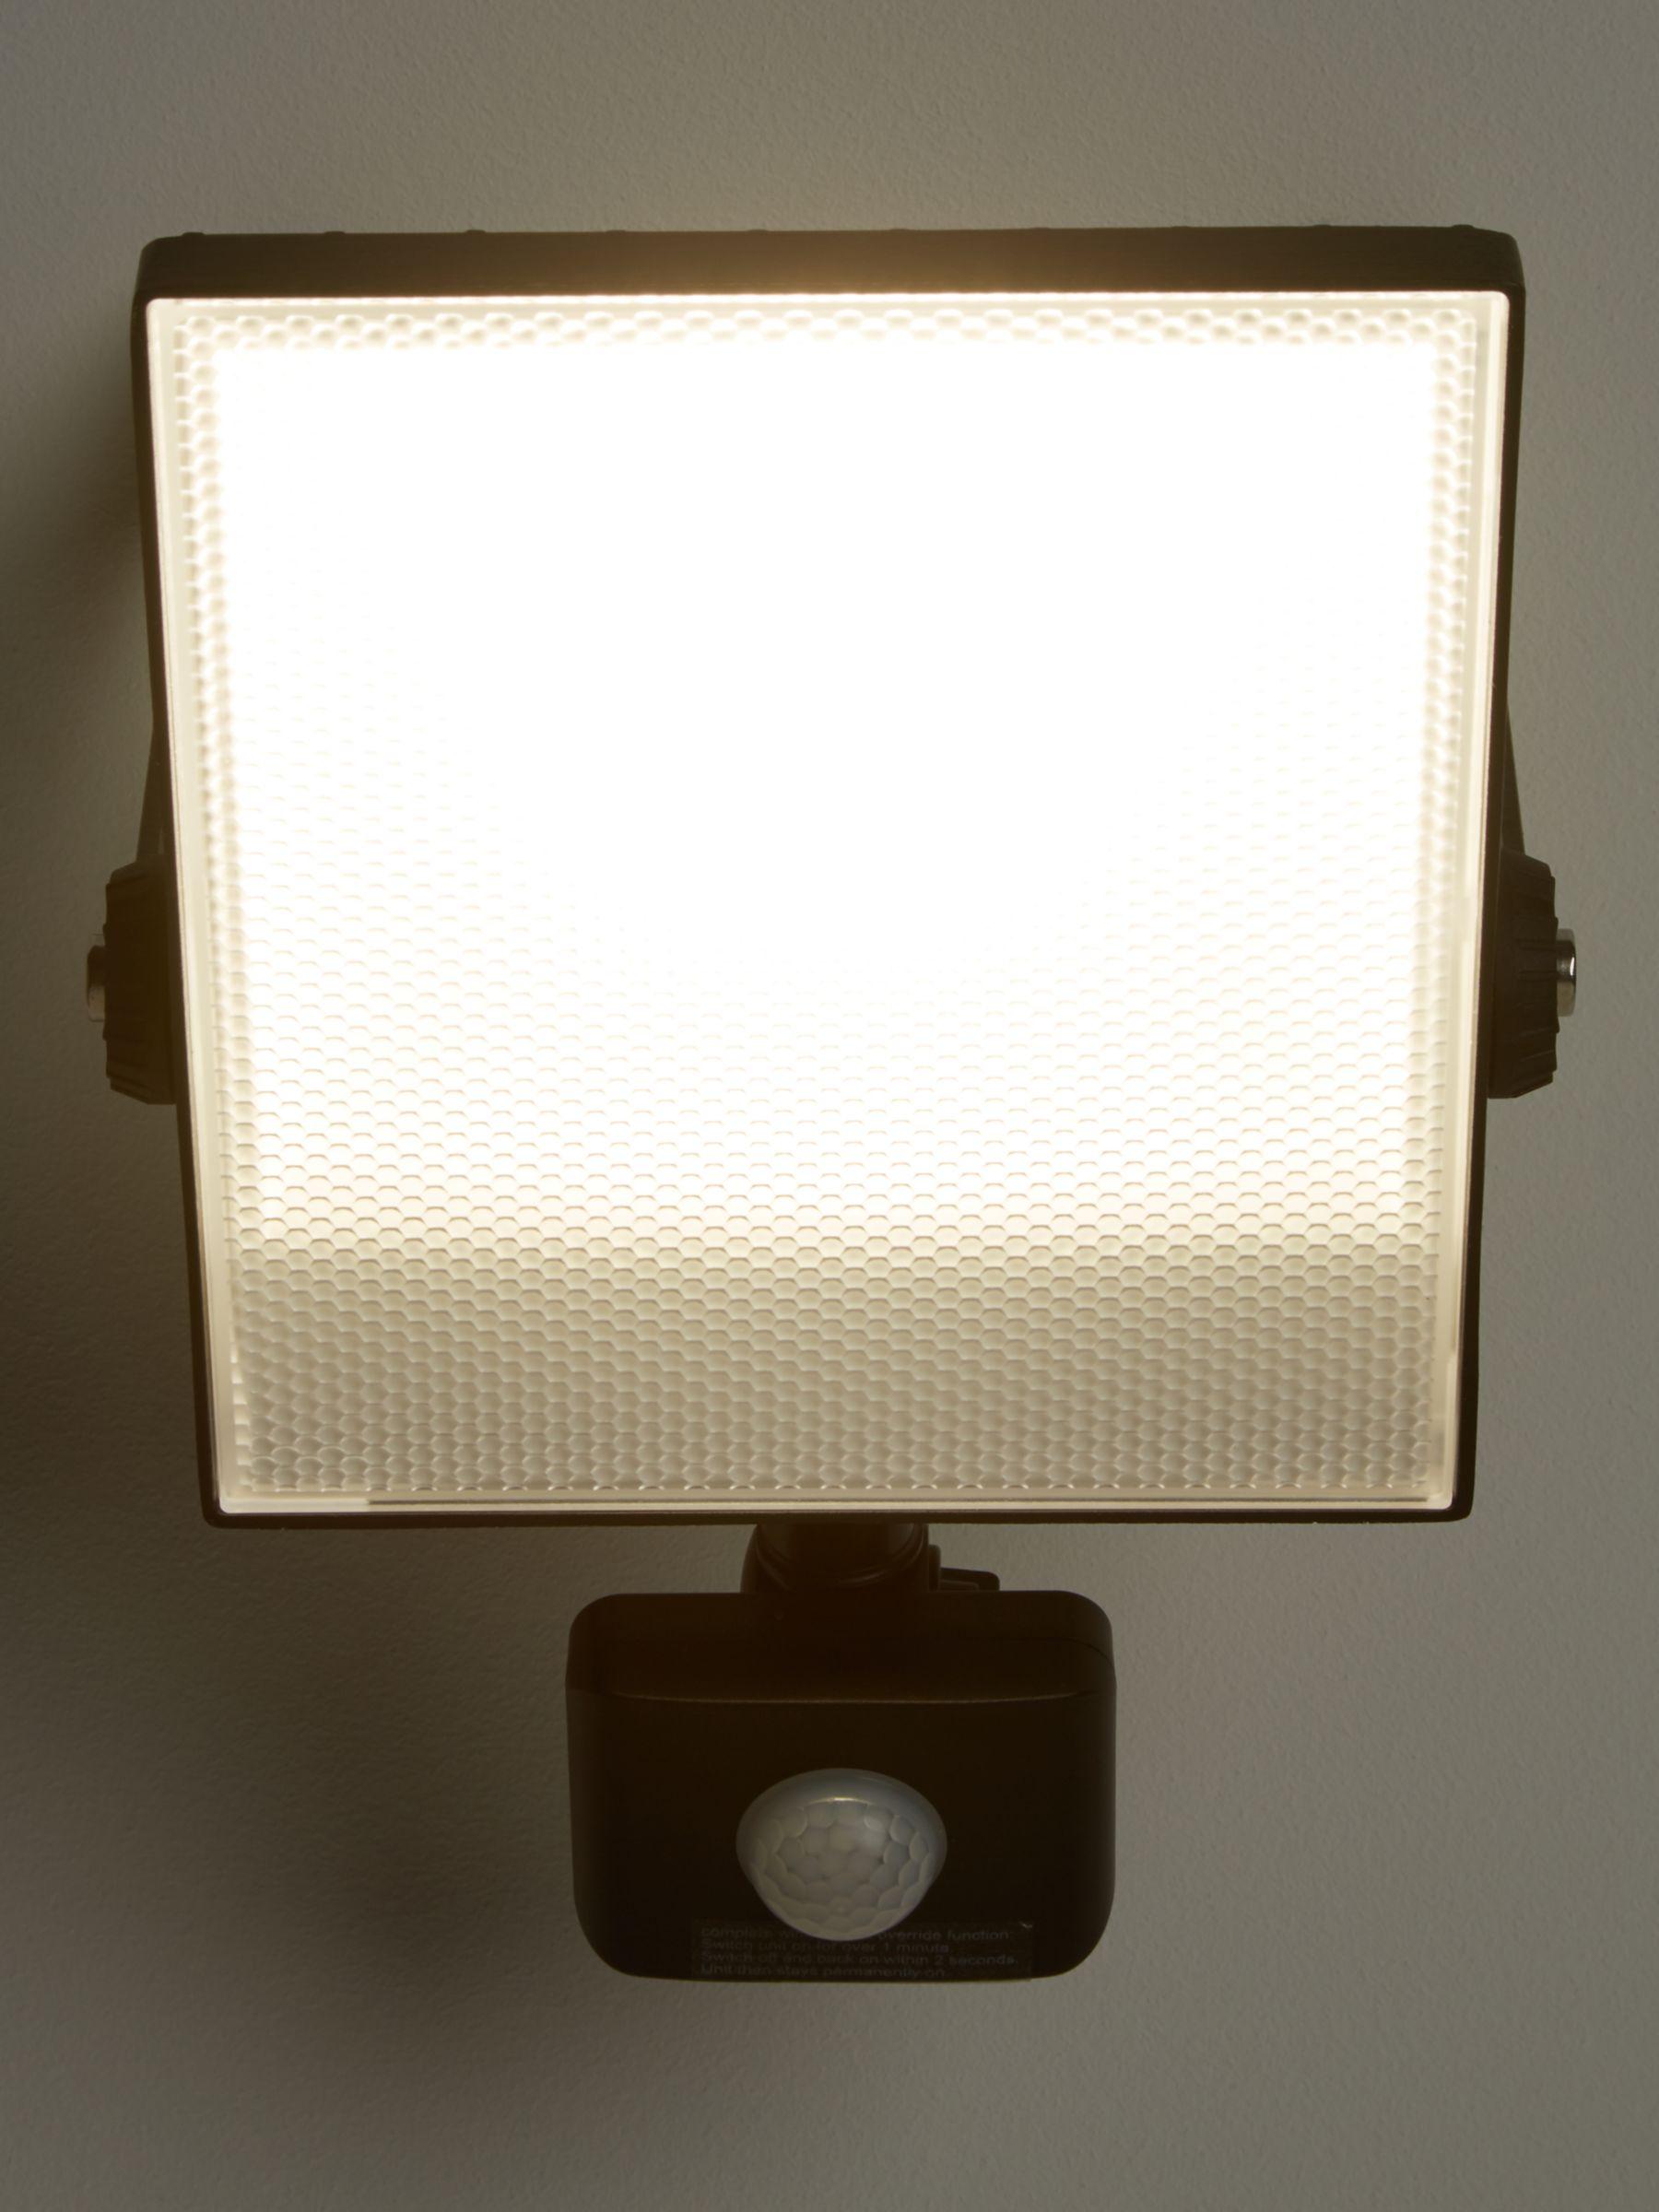 Saxby Saxby Scimitar LED Outdoor Floodlight, Black